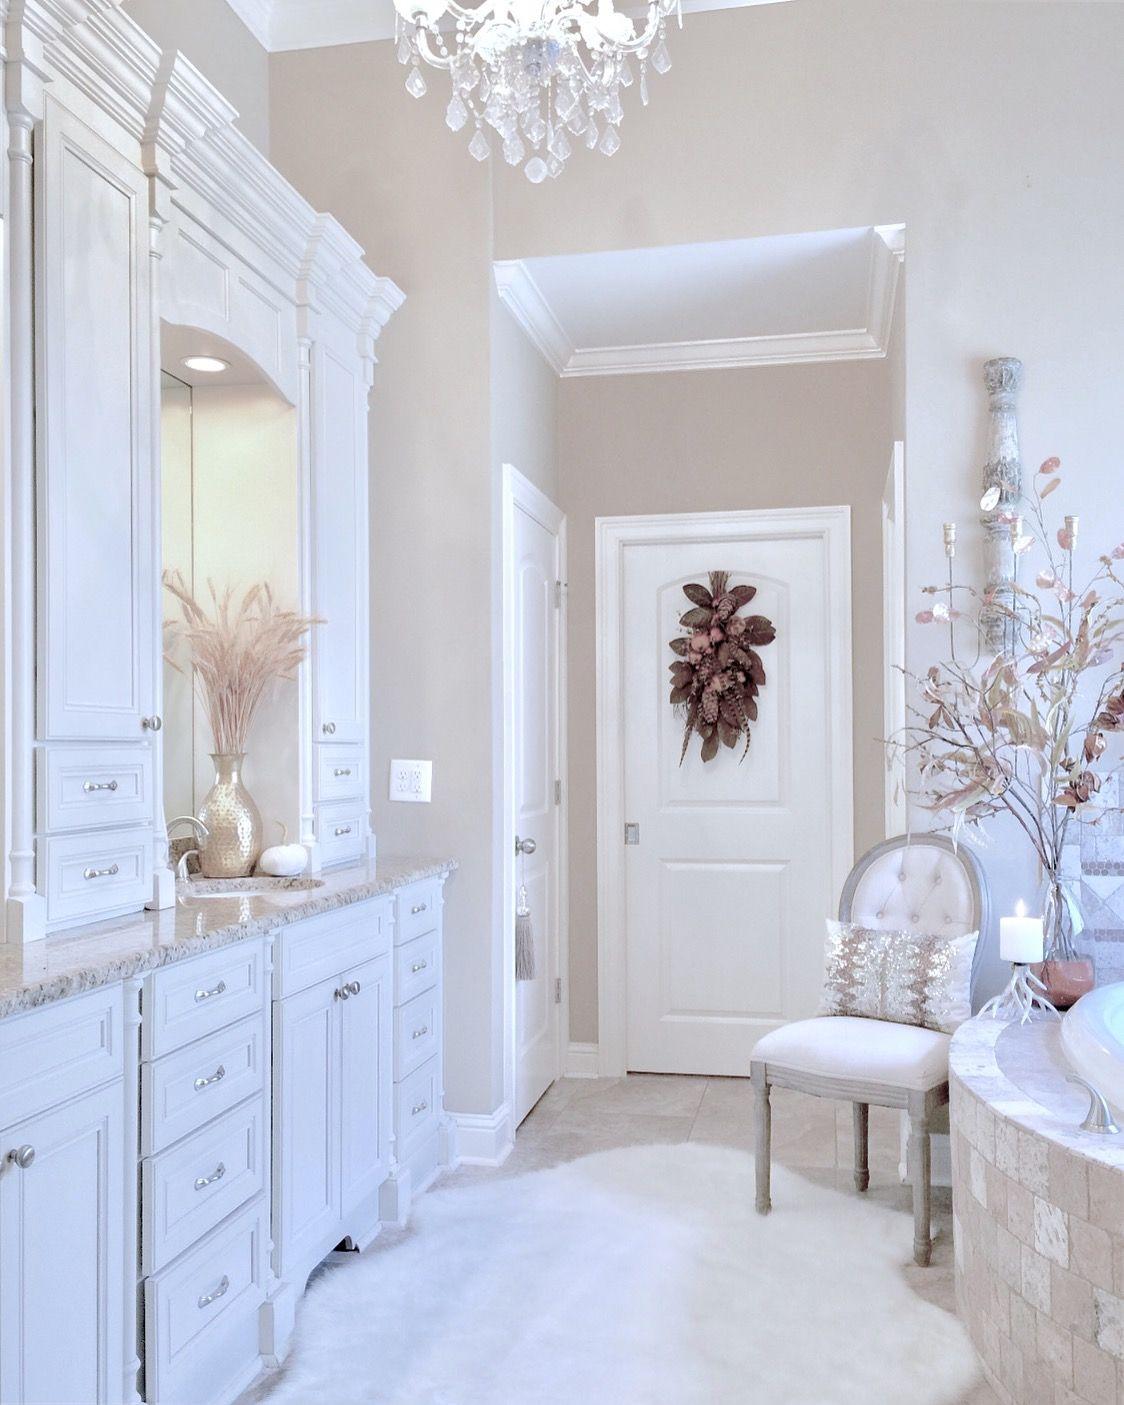 Blount Designs fall master bath | Blount Designs Master Bath ...